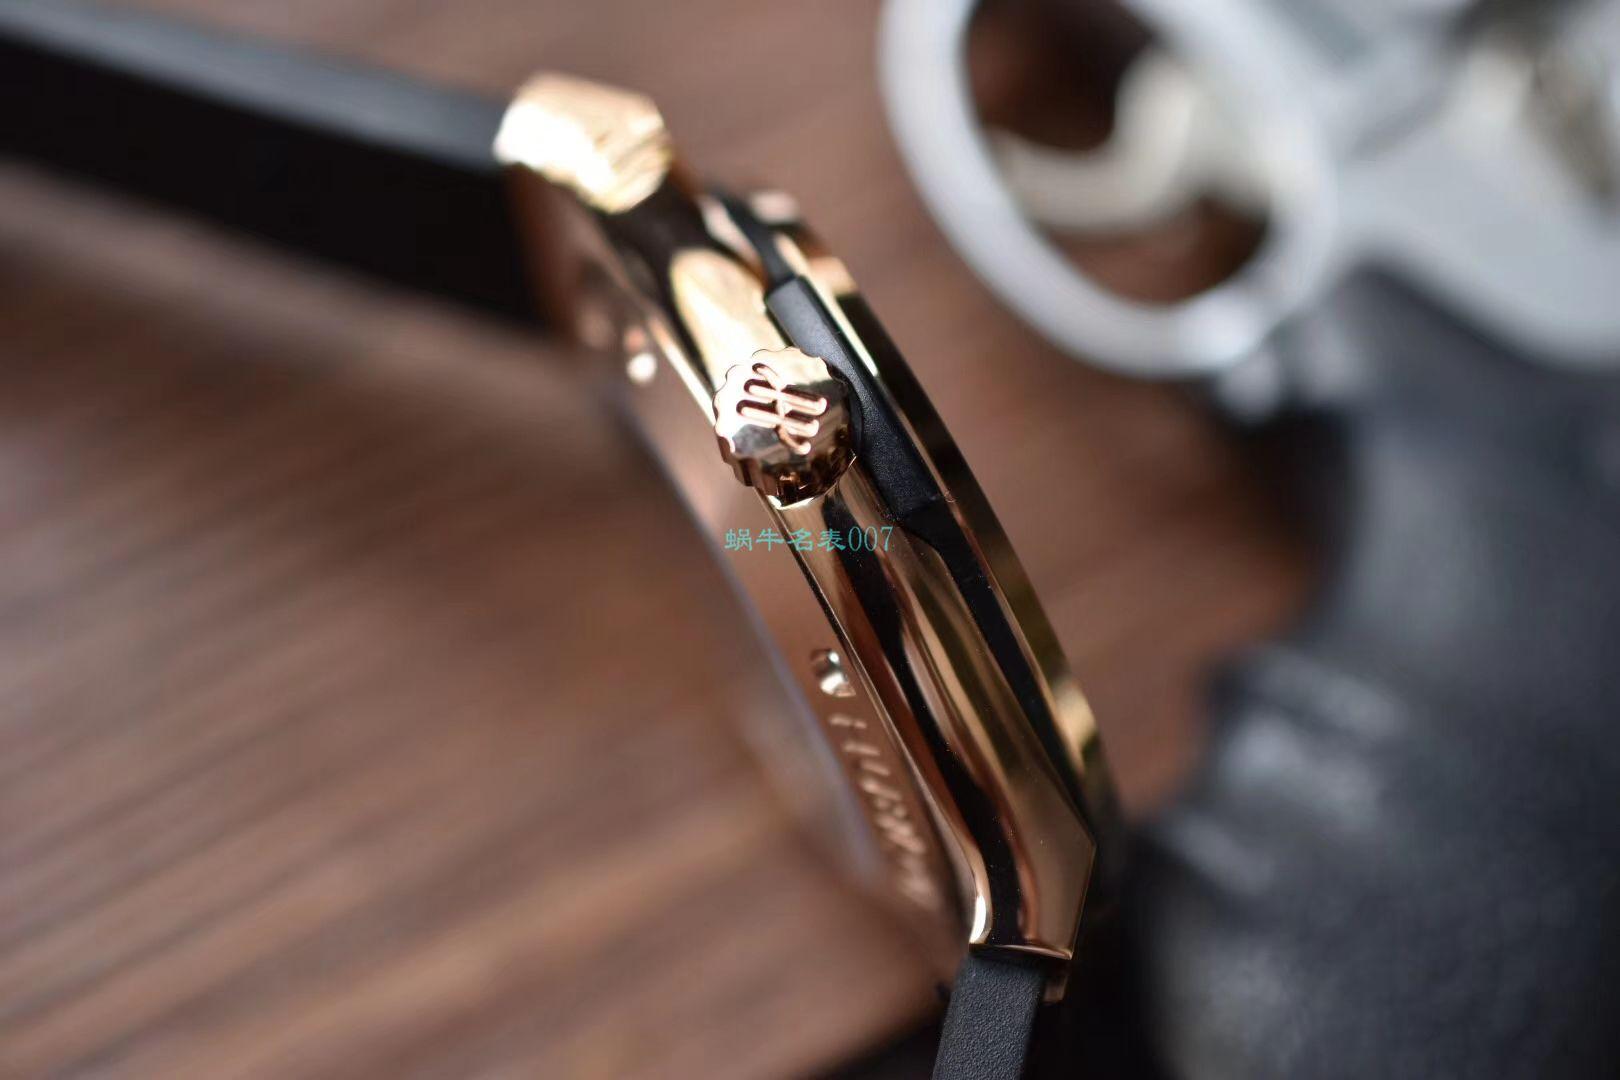 JB厂顶级复刻宇舶陀飞轮经典融合505.OX.0180.LR腕表 / YB091